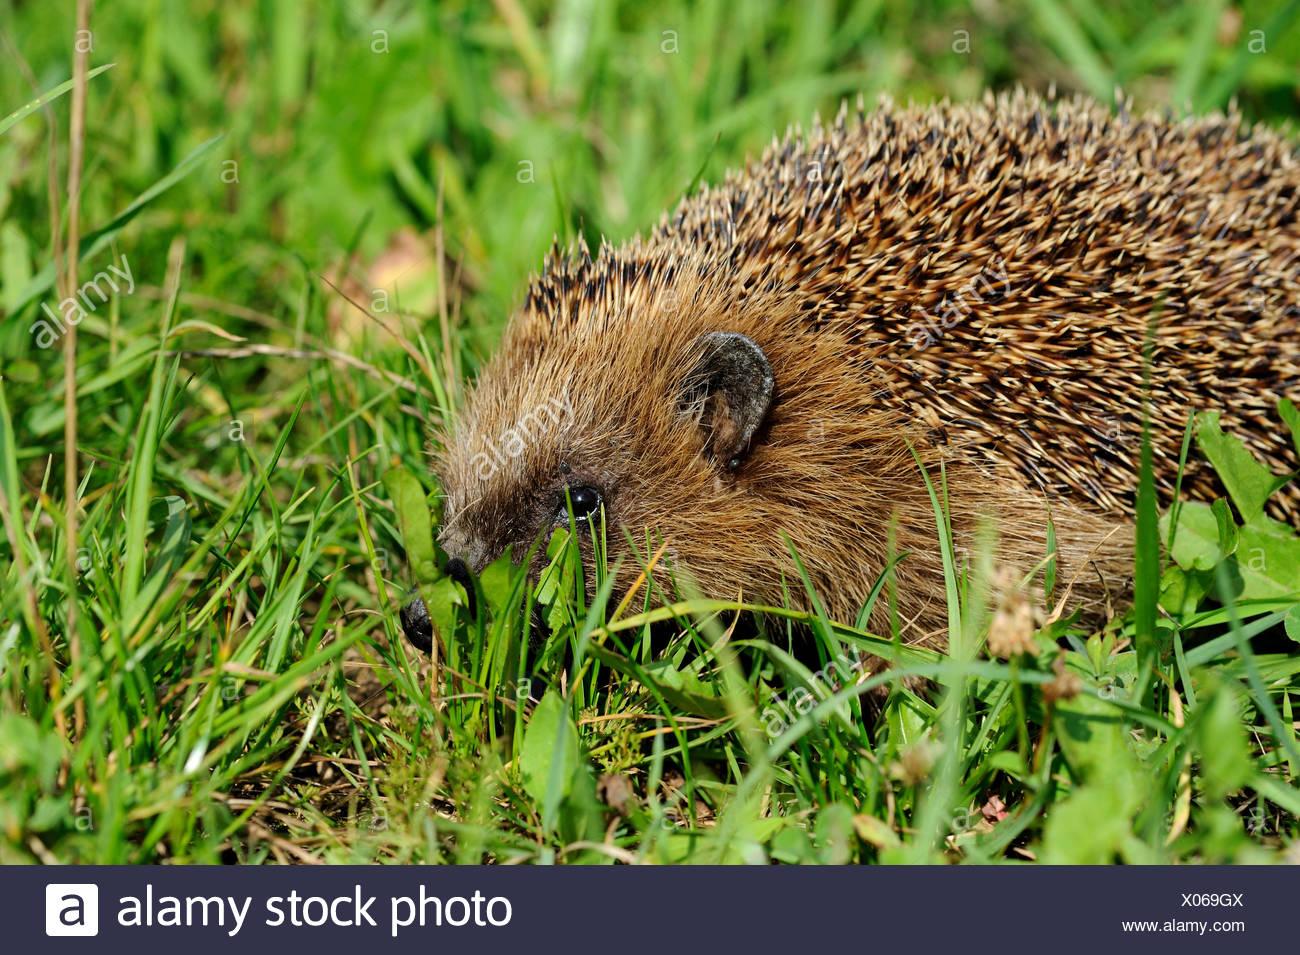 Hedgehog, bristling, Erinaceus europaeus, Common hedgehog, European, summer, hedgehog, summer, animal, animals, Germany, Europe, - Stock Image